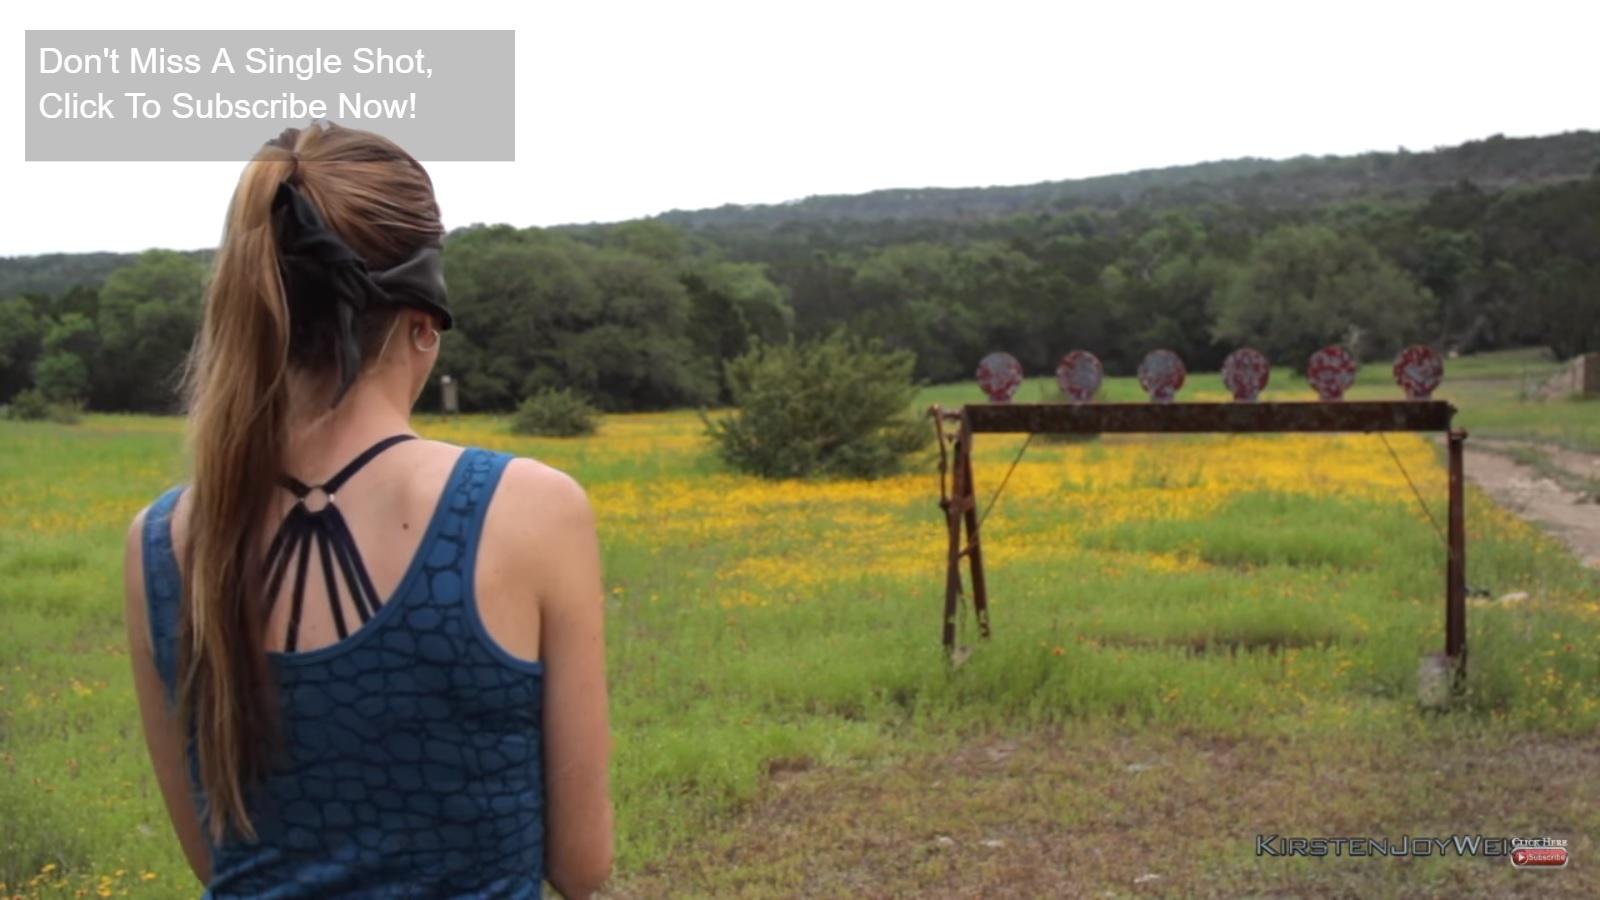 _Kirsten_Joy_Weiss_shooting_blindfold_knot_screenshot_youtube_gZImE6dJ-ww_ 2-min_41-sec_.jpg